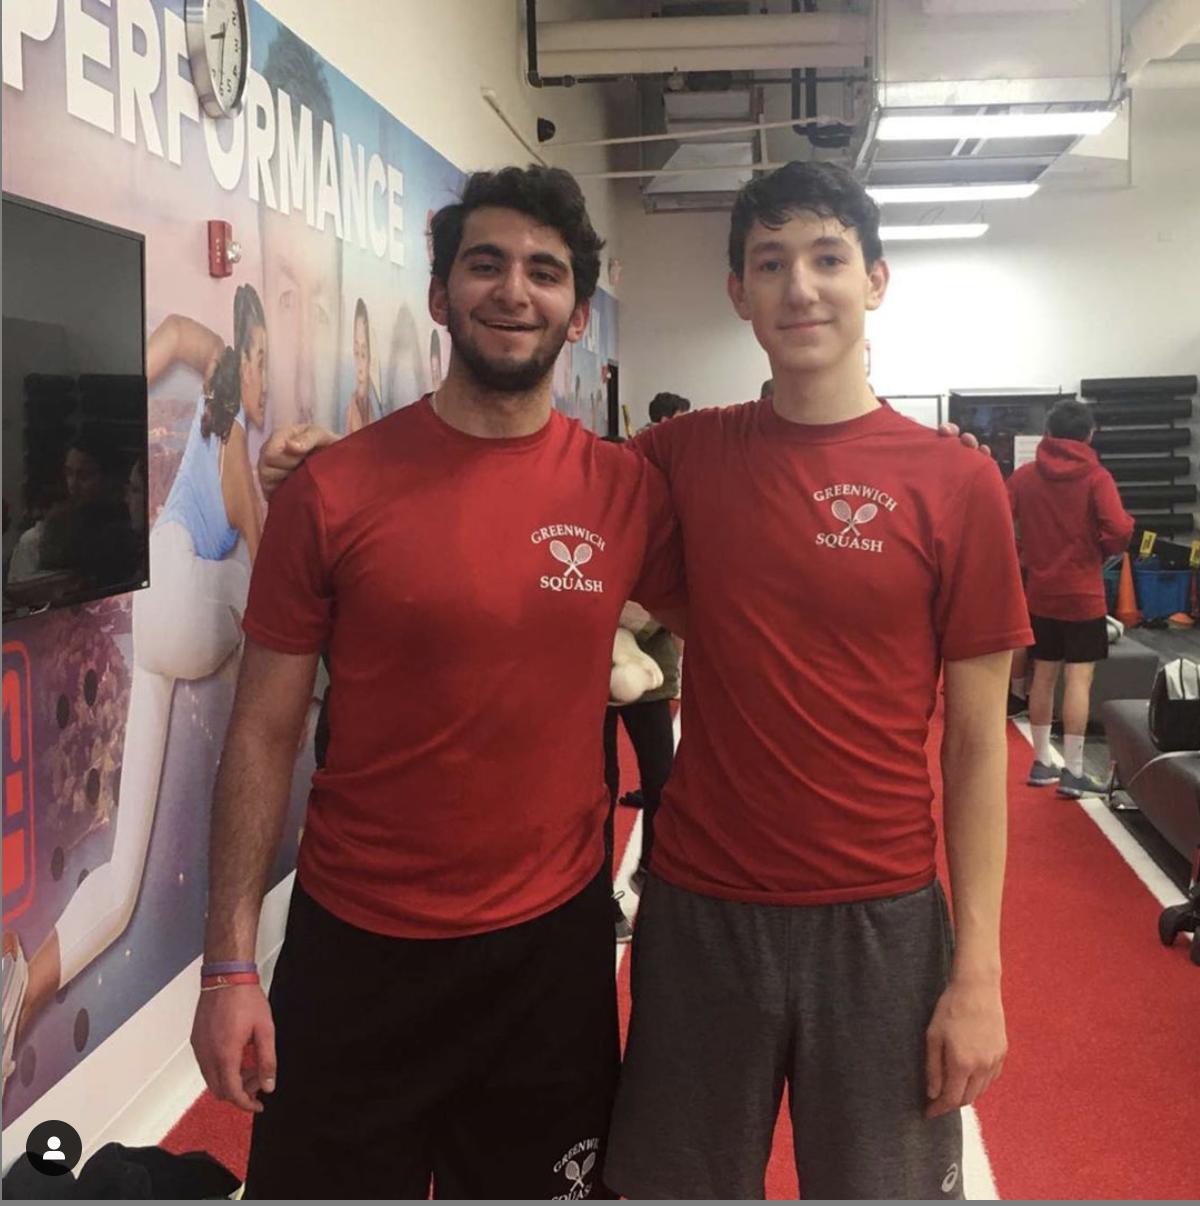 GHS B squash team members Zane Khader (2